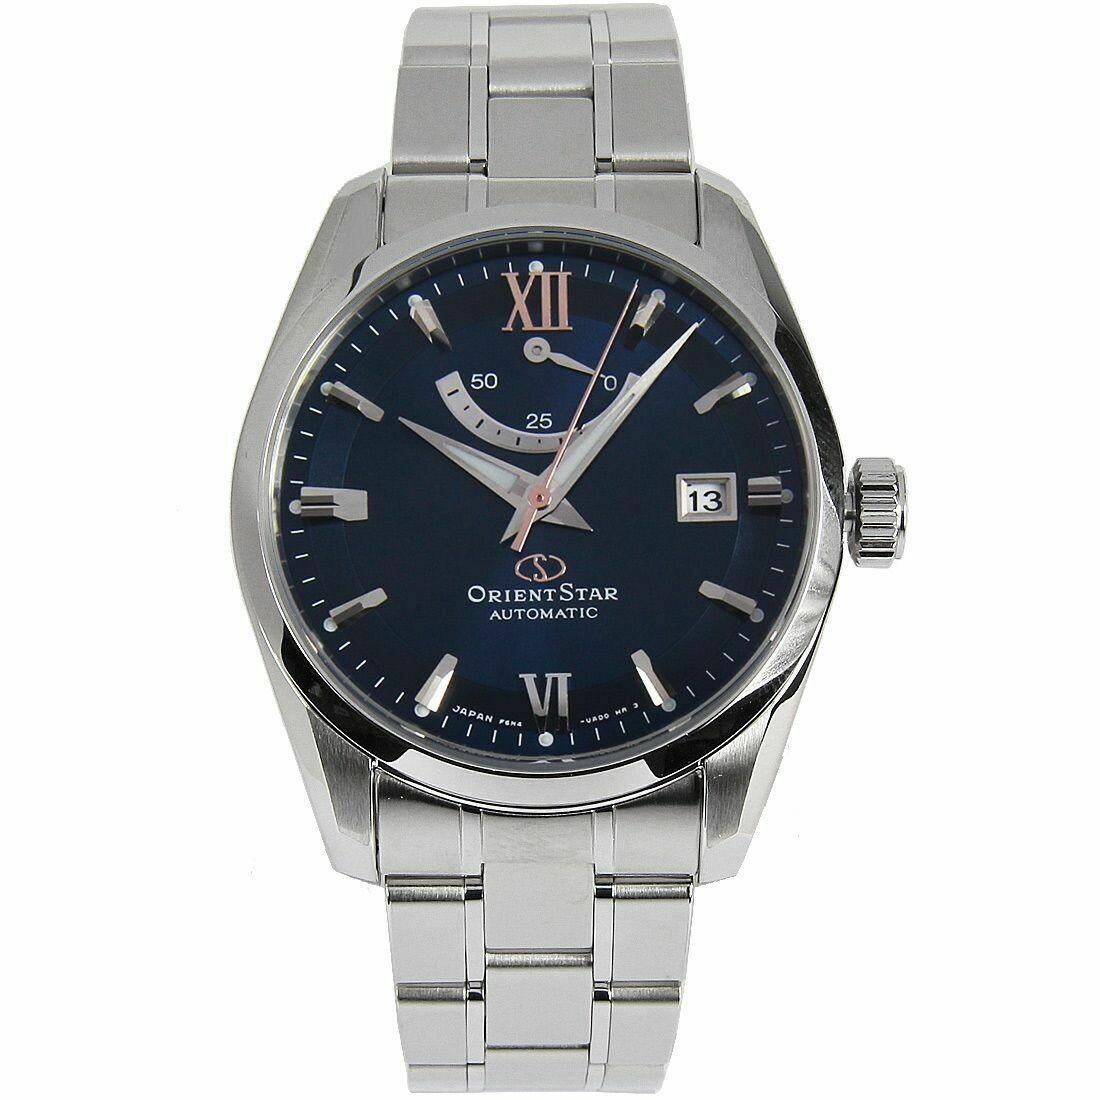 Reloj automático hombre Orient Star RE-AU0005L dial azul cristal zafiro correa de acero 100m WR